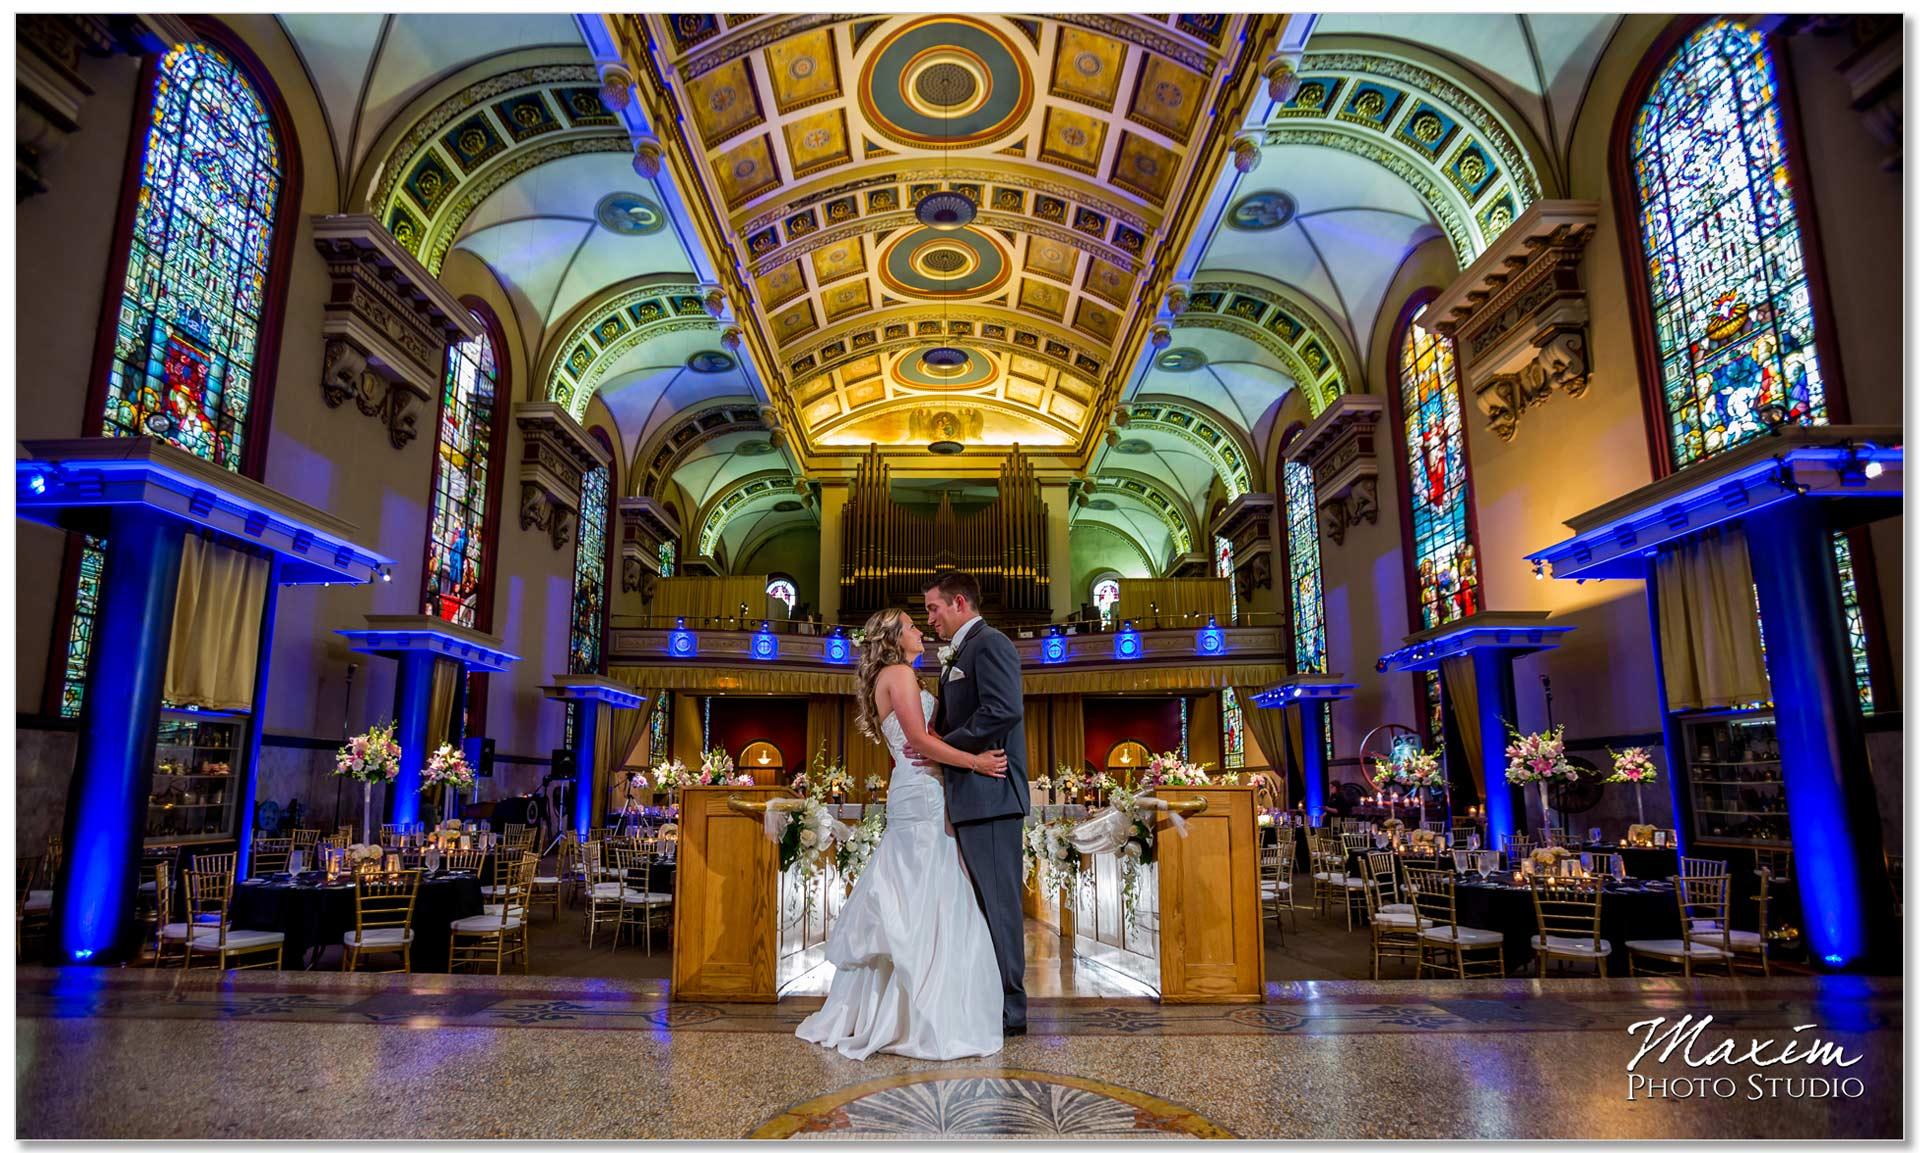 Bell event centre cincinnati wedding purple pictures